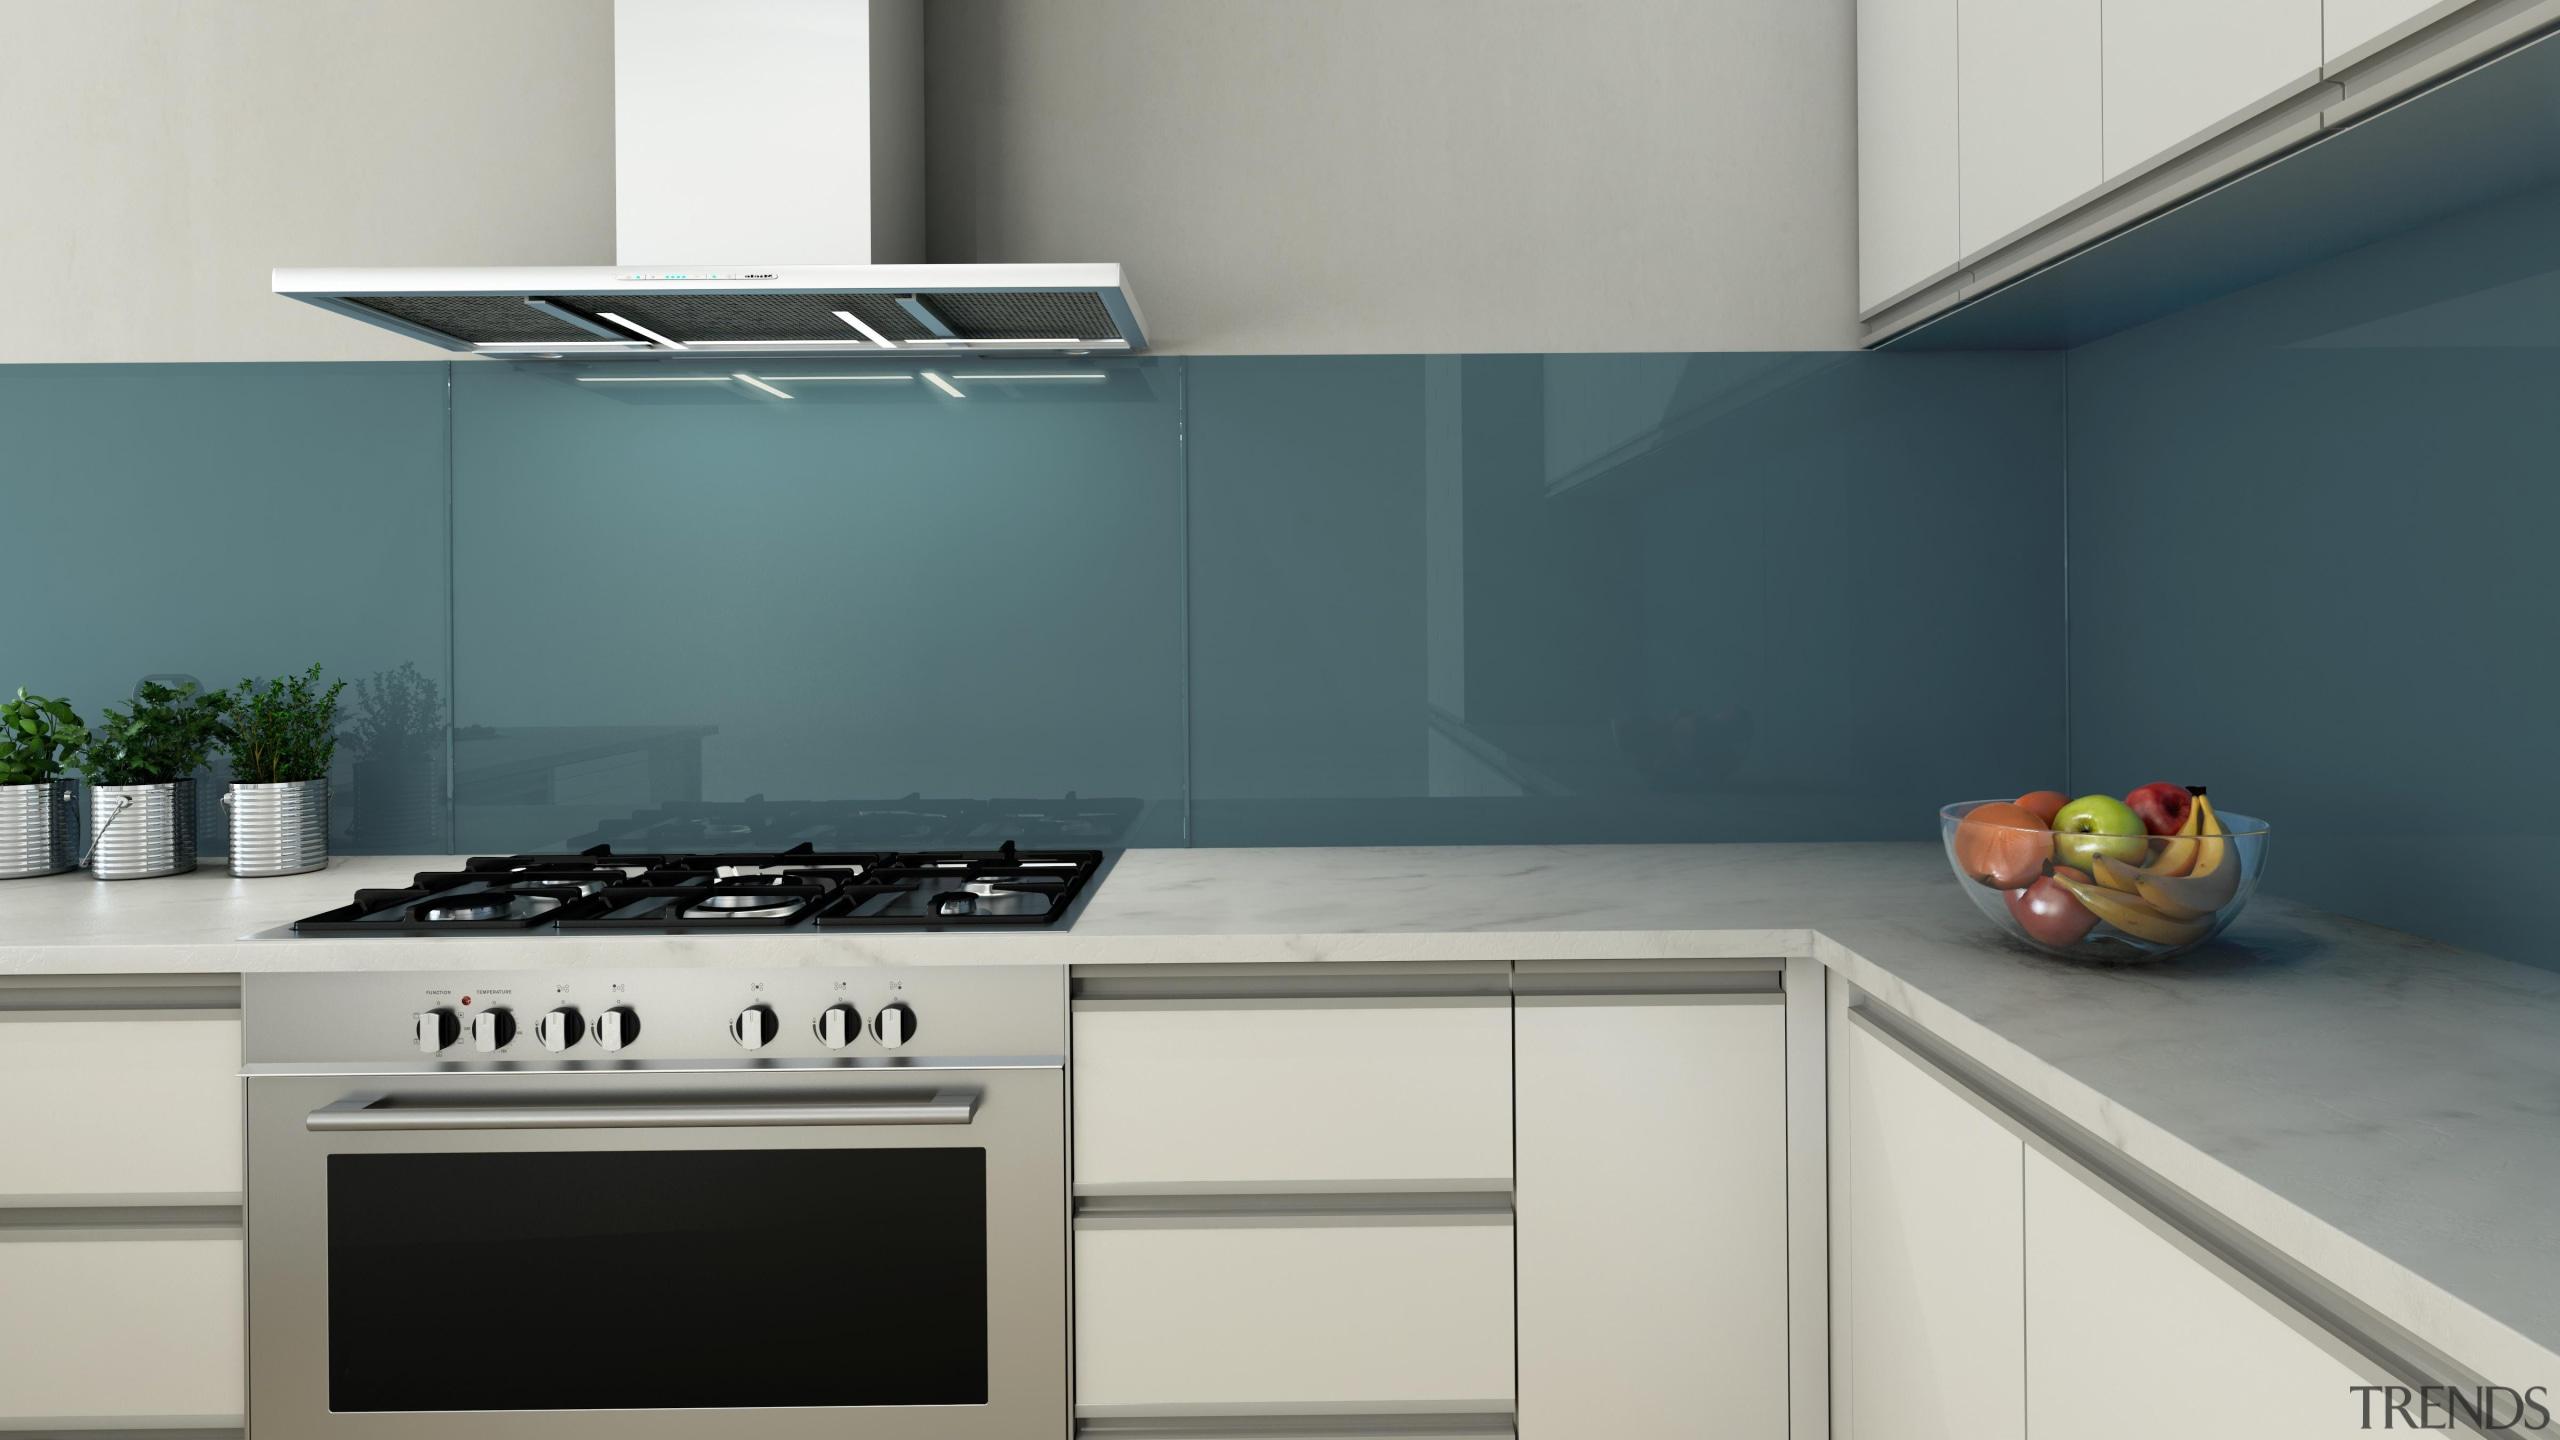 This kitchen uses Seratone Amy's Amnesia as a countertop, home appliance, interior design, kitchen, kitchen stove, product design, gray